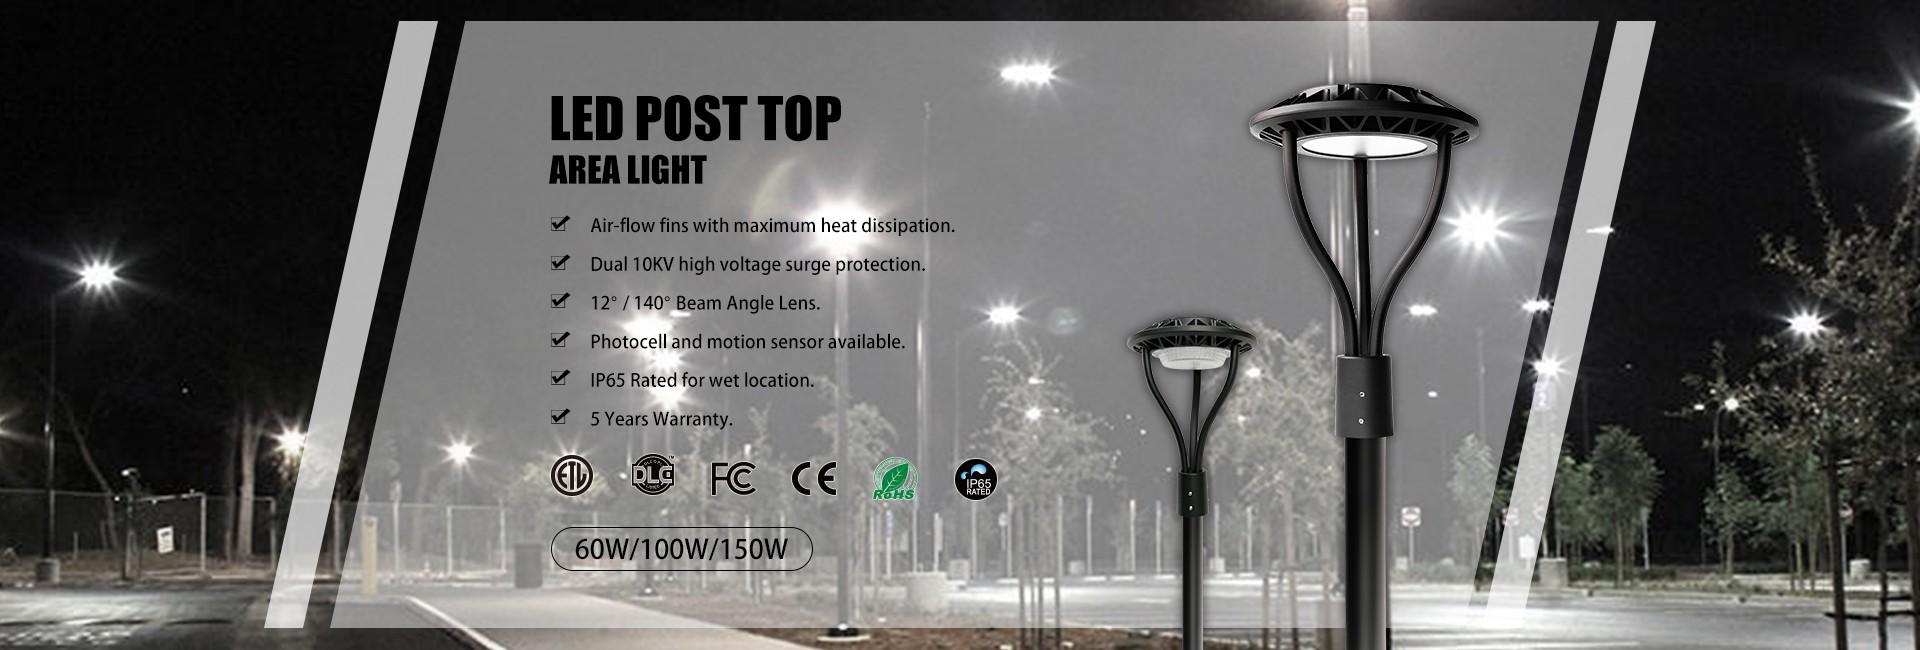 LED Post Top Area Light